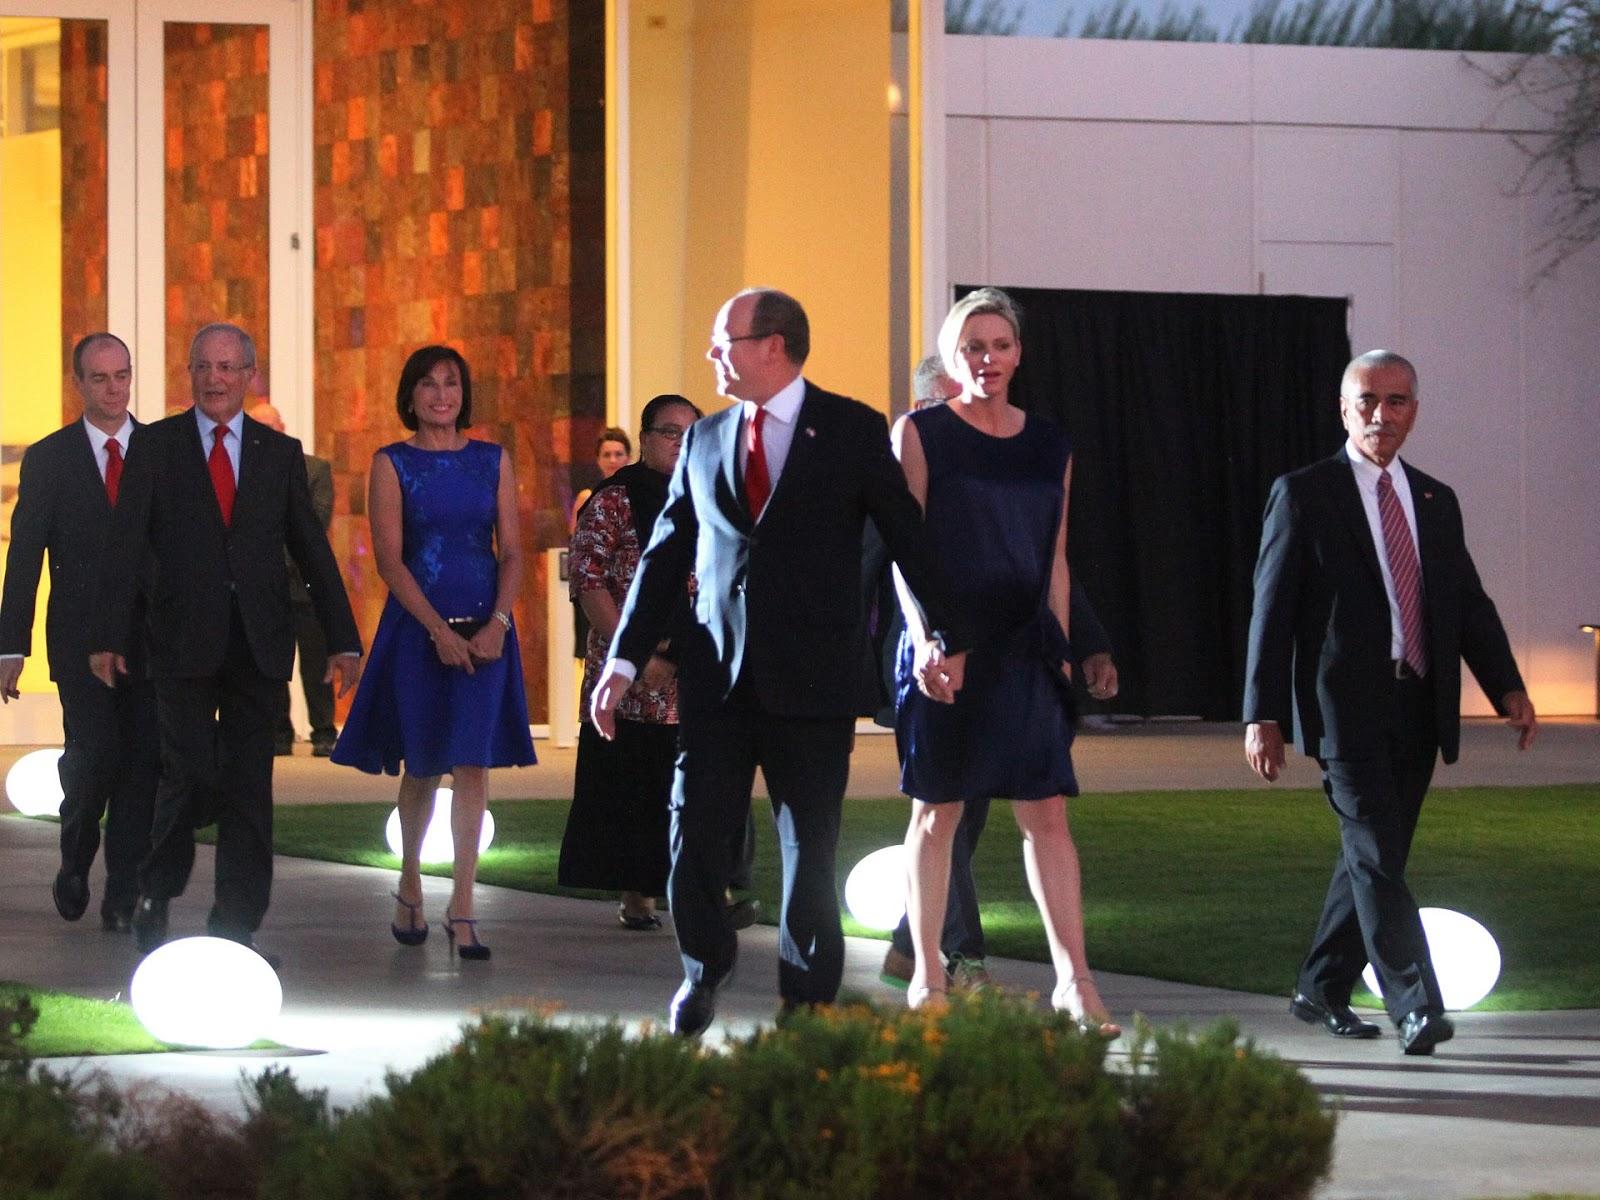 Prince Albert II of Monaco and Princess Charlene with Kiribati President Anote Tong arrive to the Prince Albert II of Monaco Foundation Awards